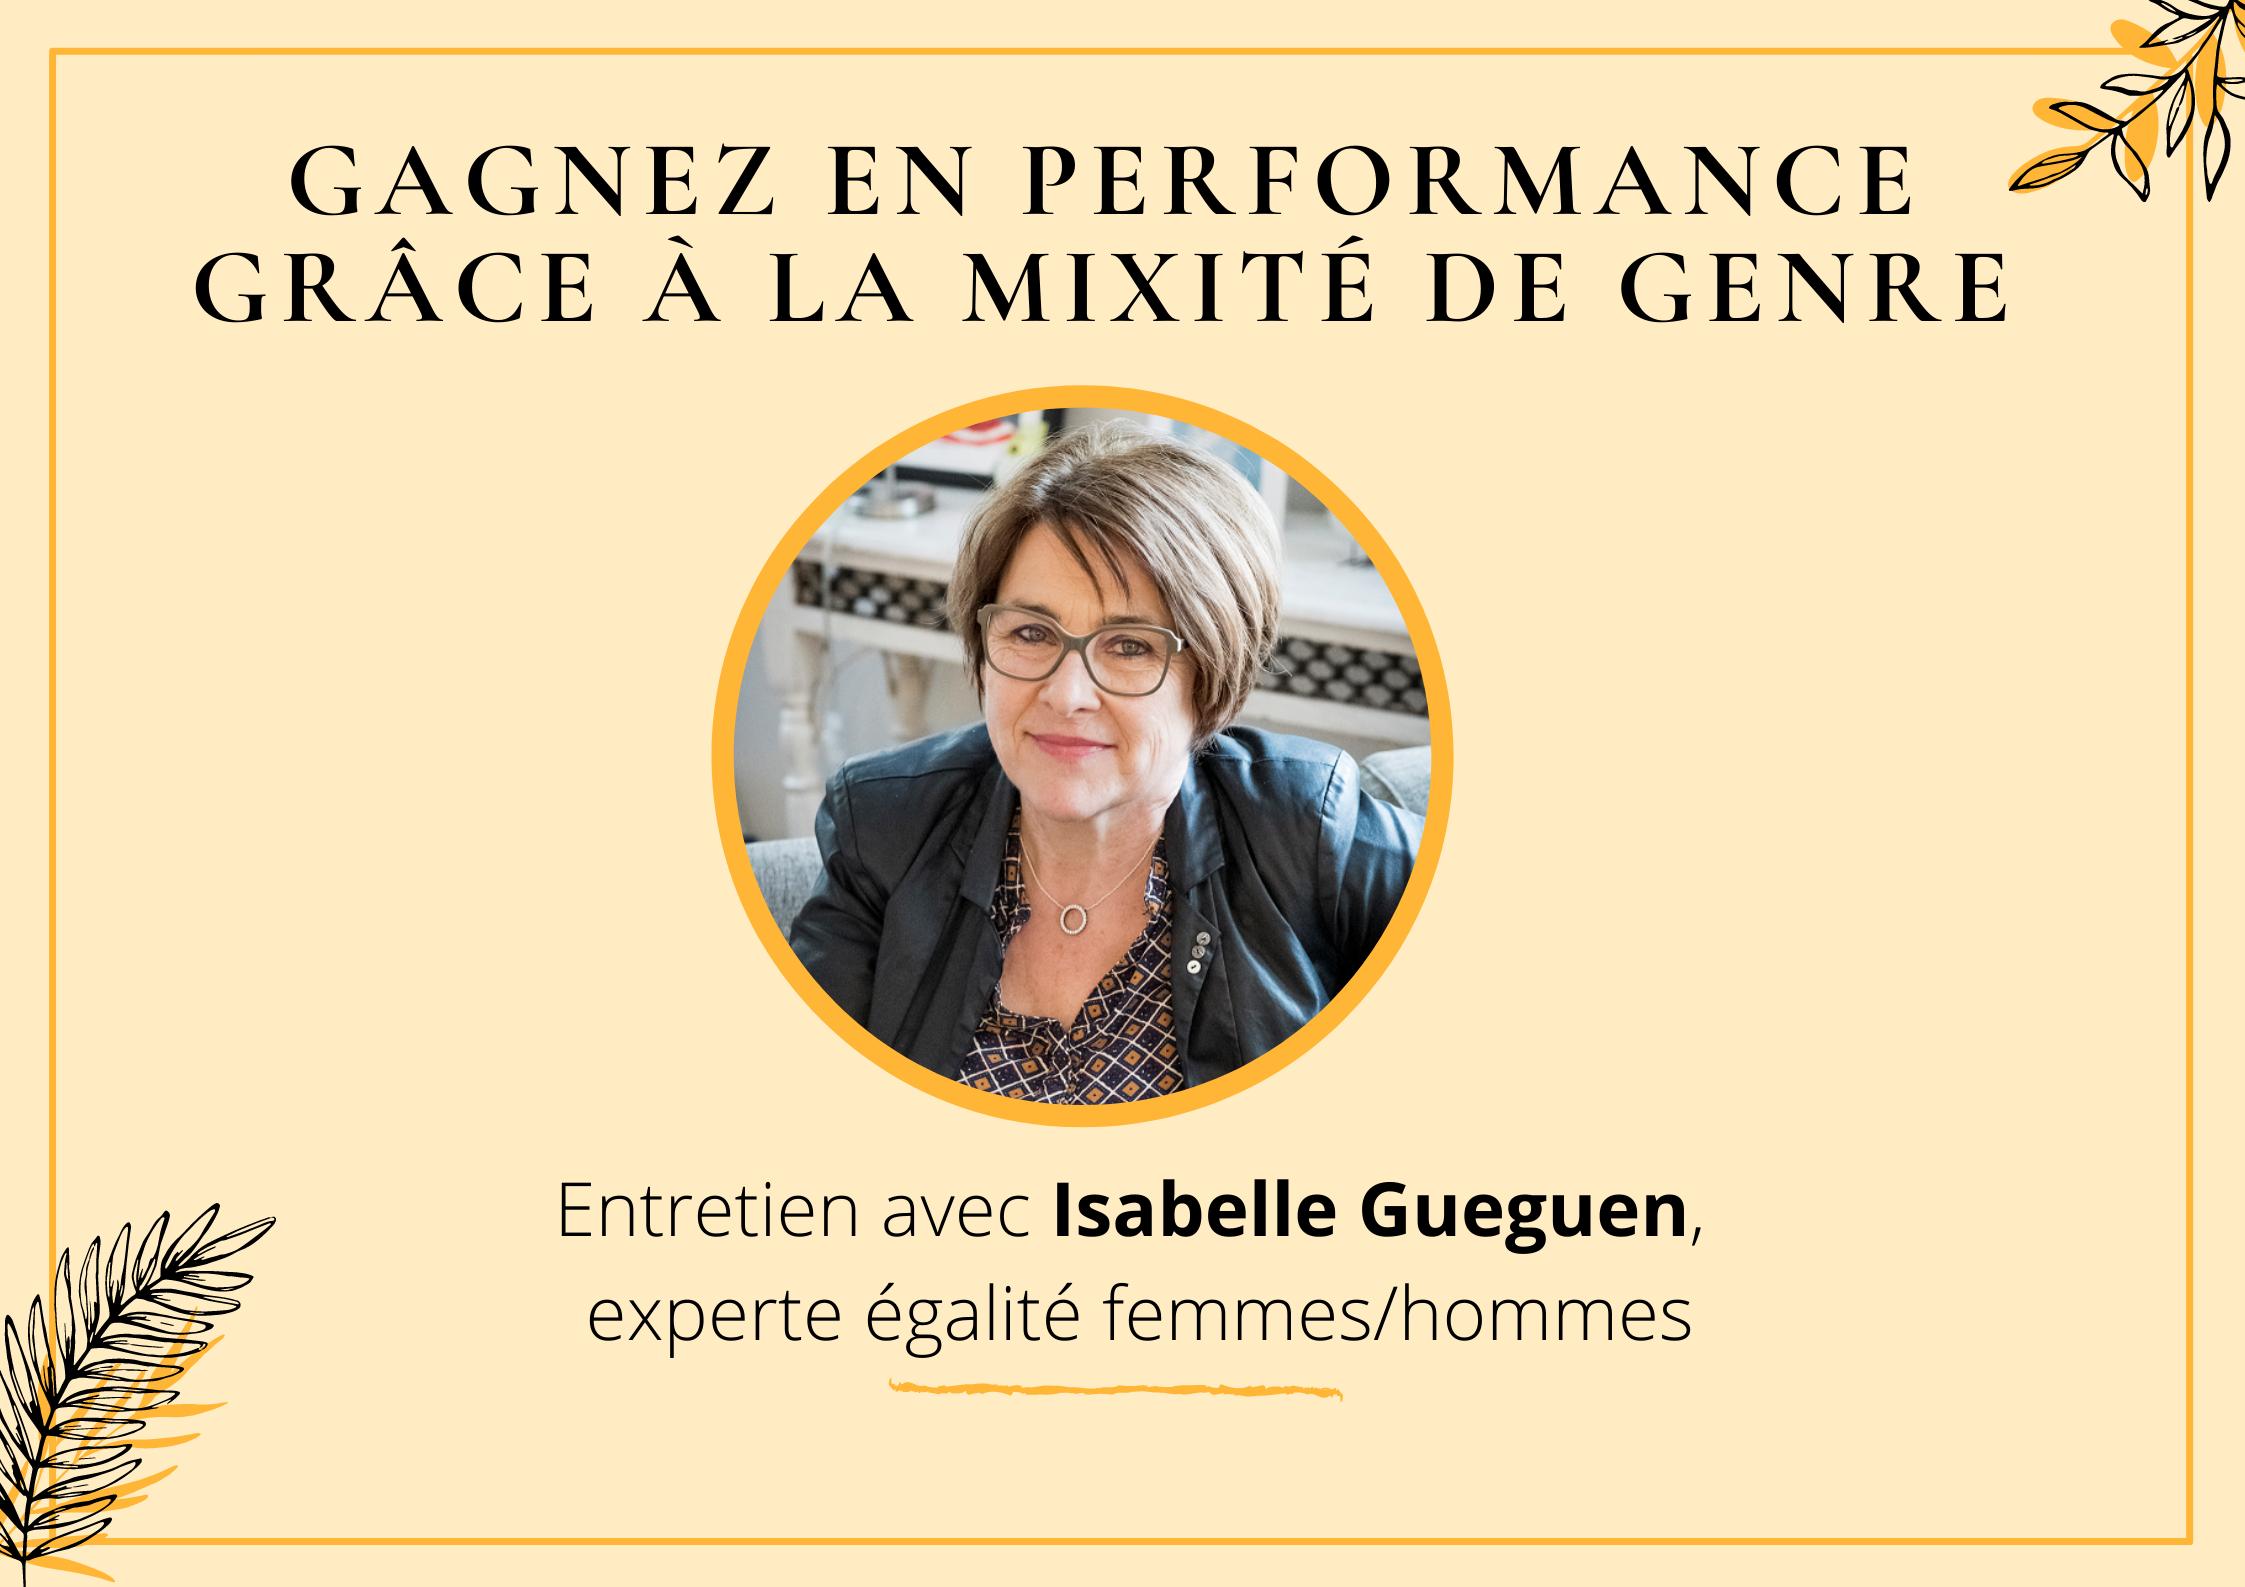 Isabelle Gueguen Experte egalite femmes hommes